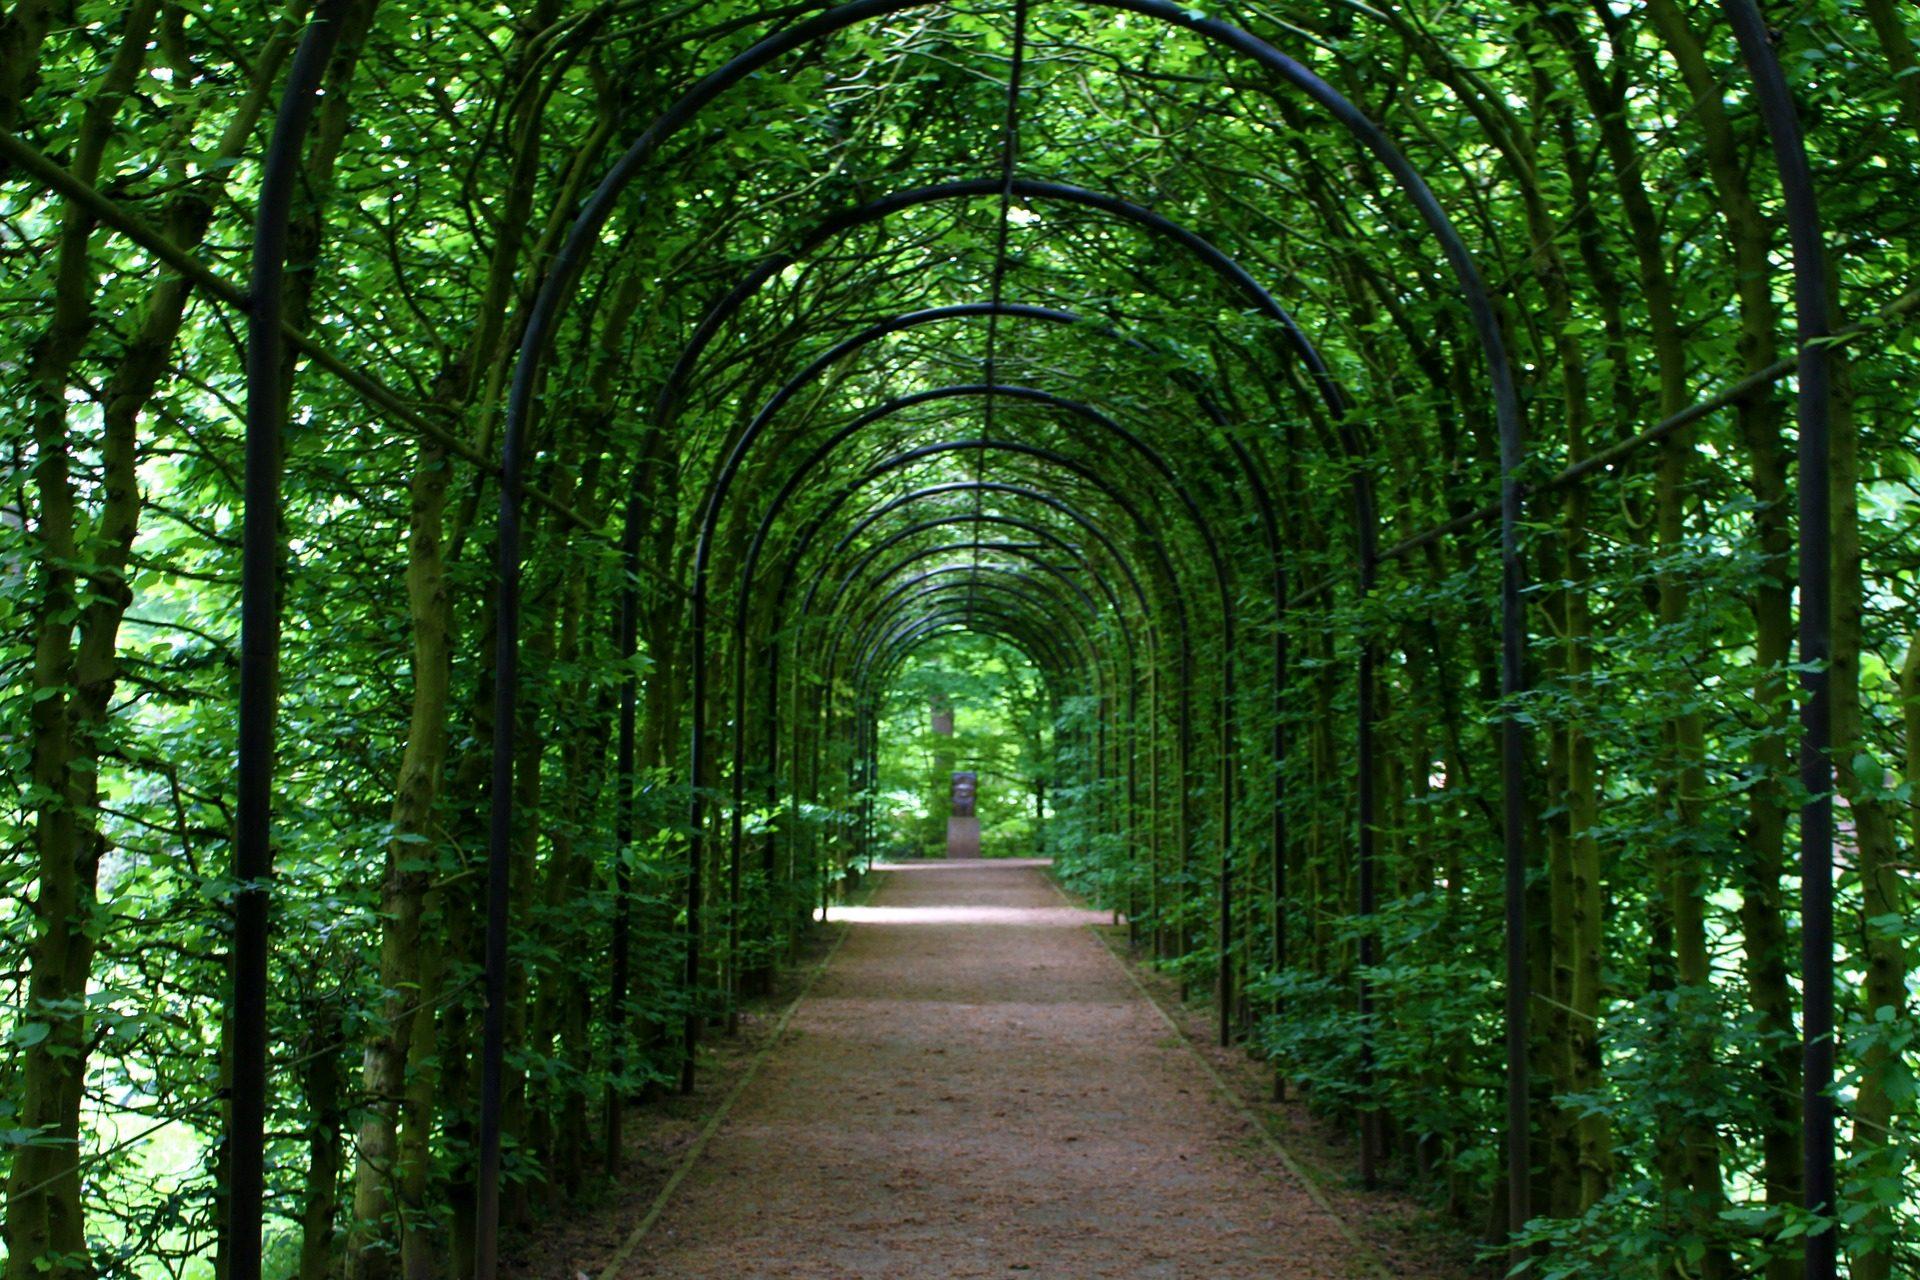 pasaje, 通道, 隧道, 道路, 植被, 树木 - 高清壁纸 - 教授-falken.com